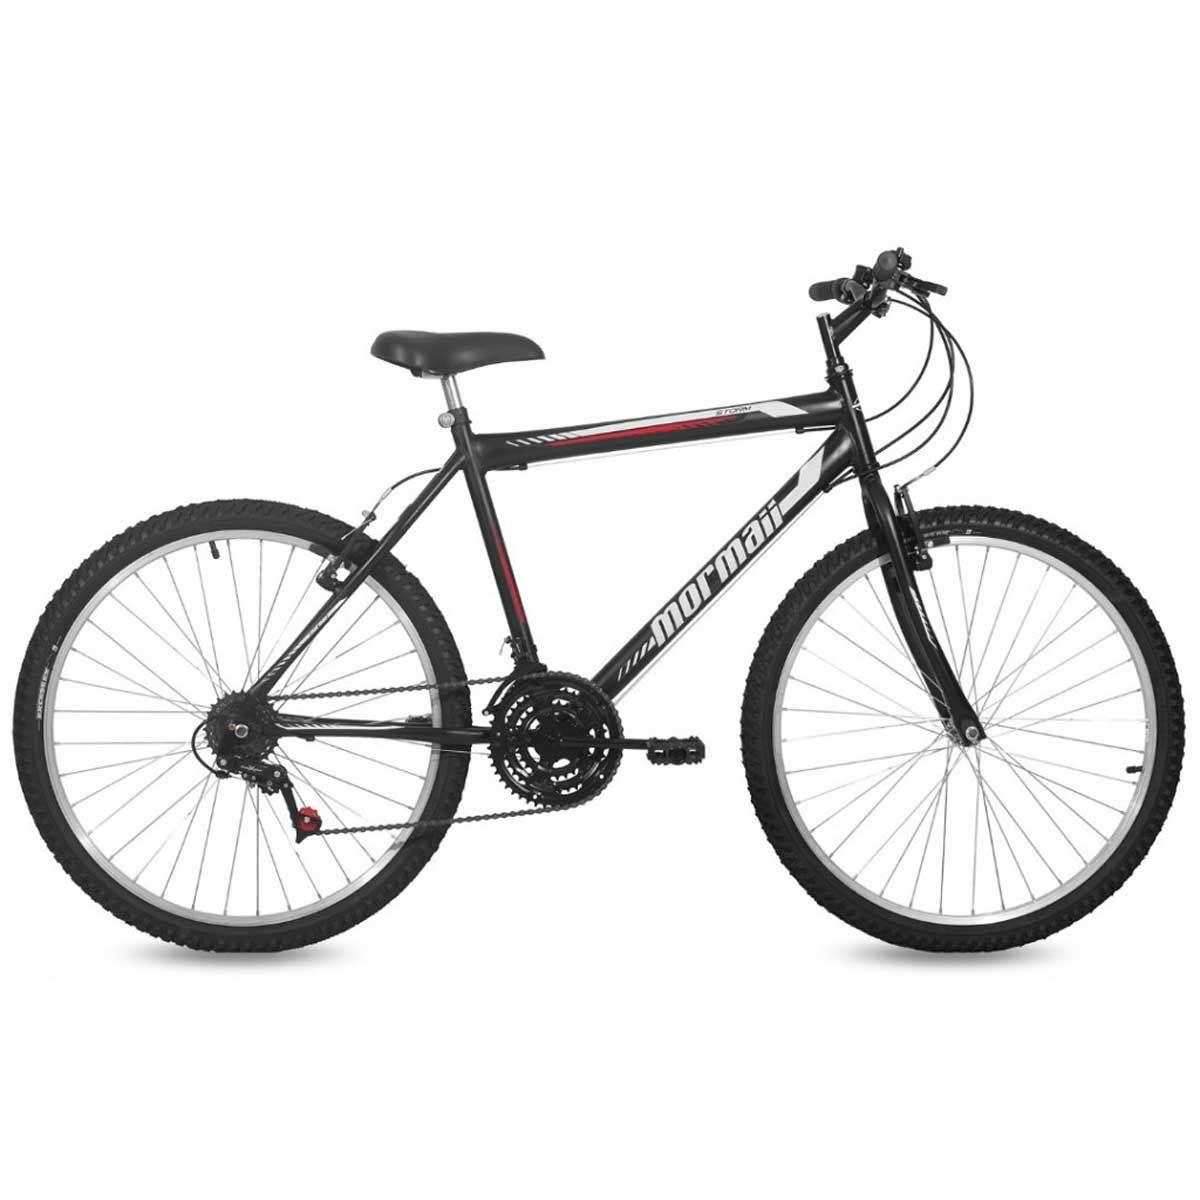 Bicicleta Mormaii Storm Aro 26 Rígida 18 Marchas - Preto